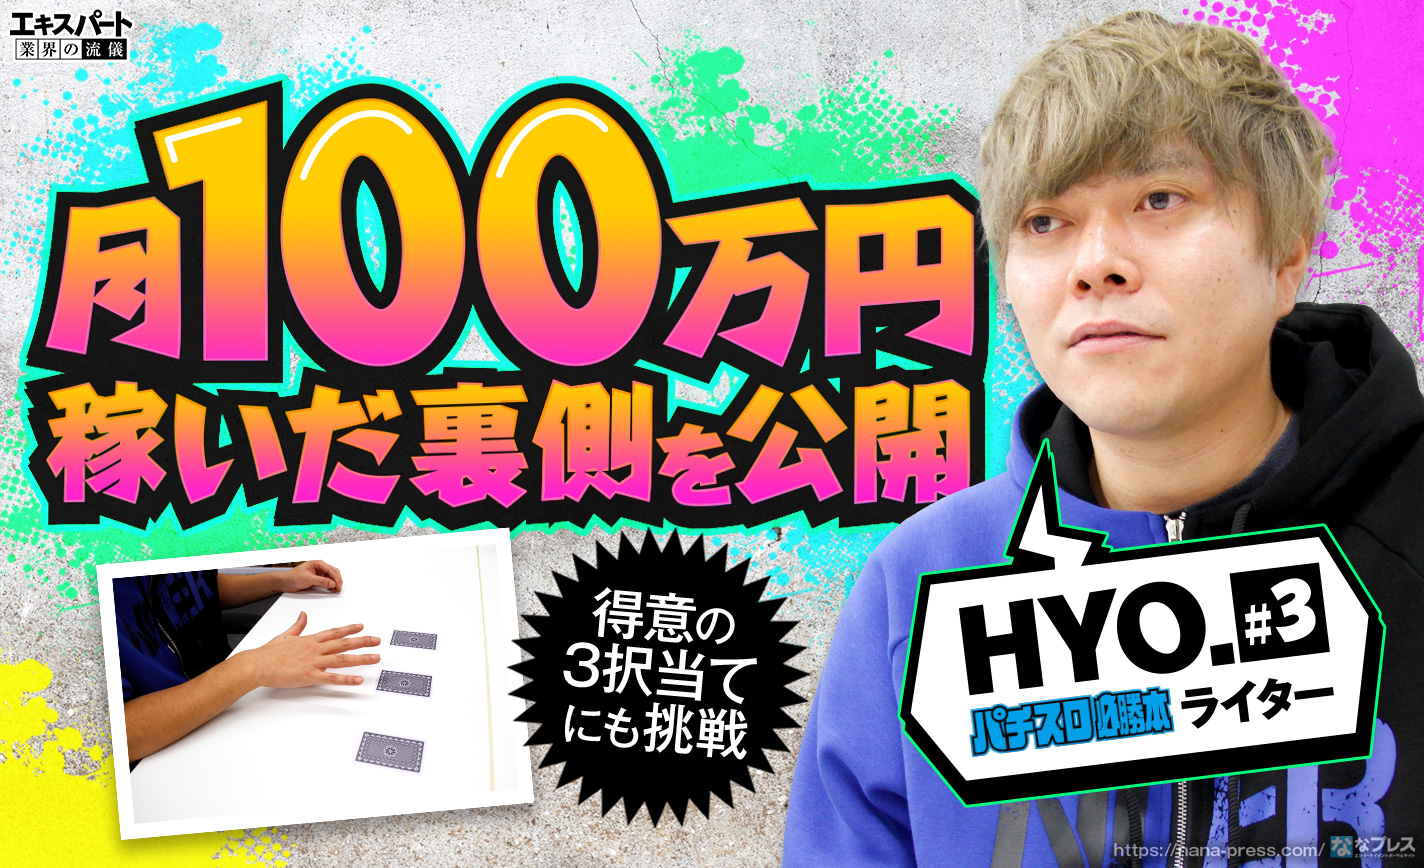 HYO.が月100万円稼いだ裏側を公開!得意の3択当てにも挑戦します eyecatch-image